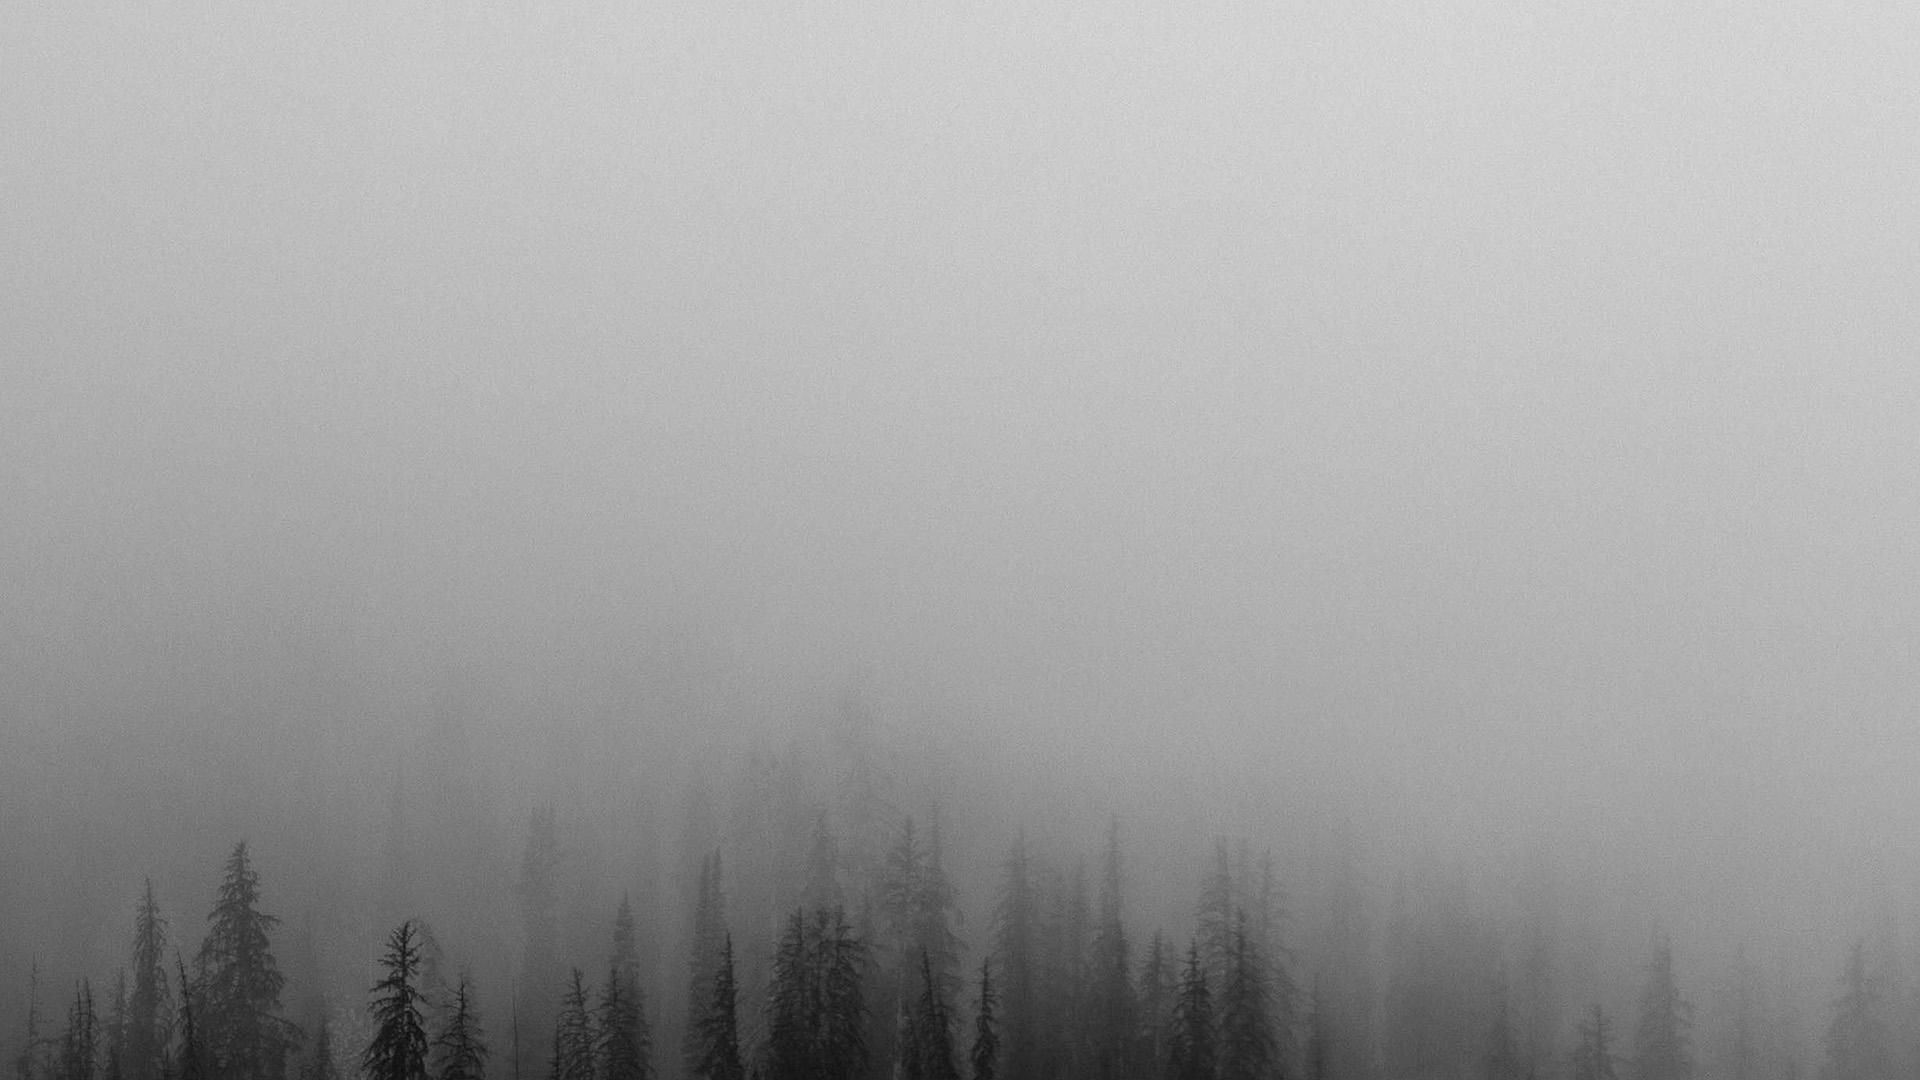 Winter Fall Mac Wallpaper No61 Fog Minimal Mountain Wood Nature Wallpaper